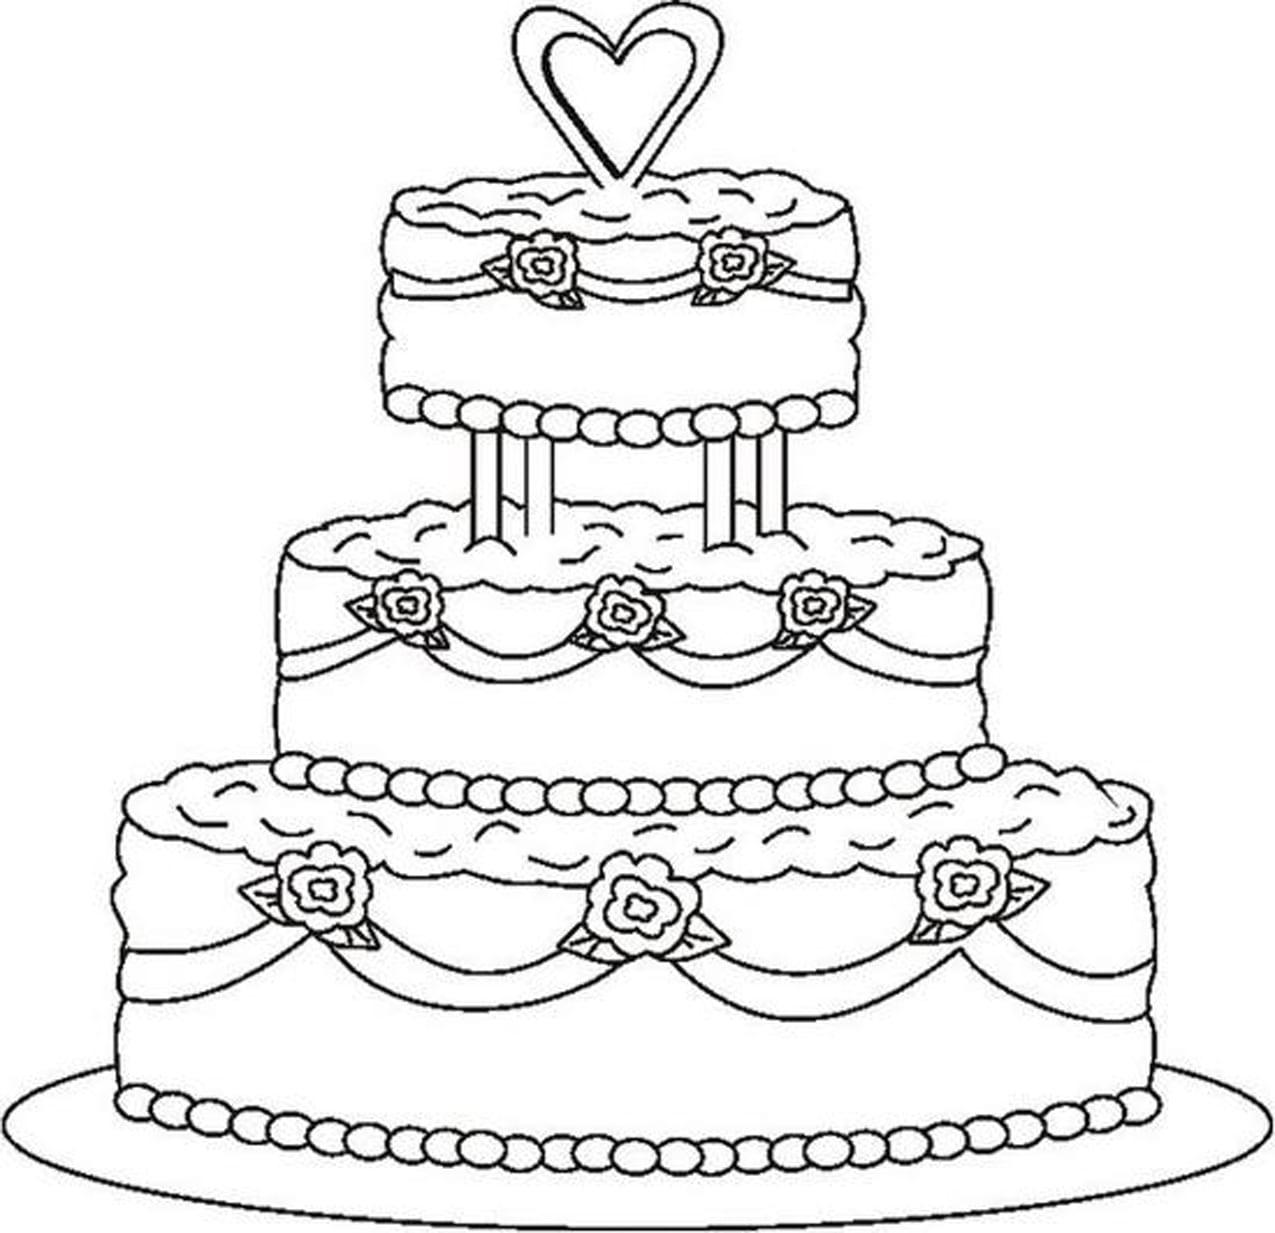 Wedding Cake Coloring Page